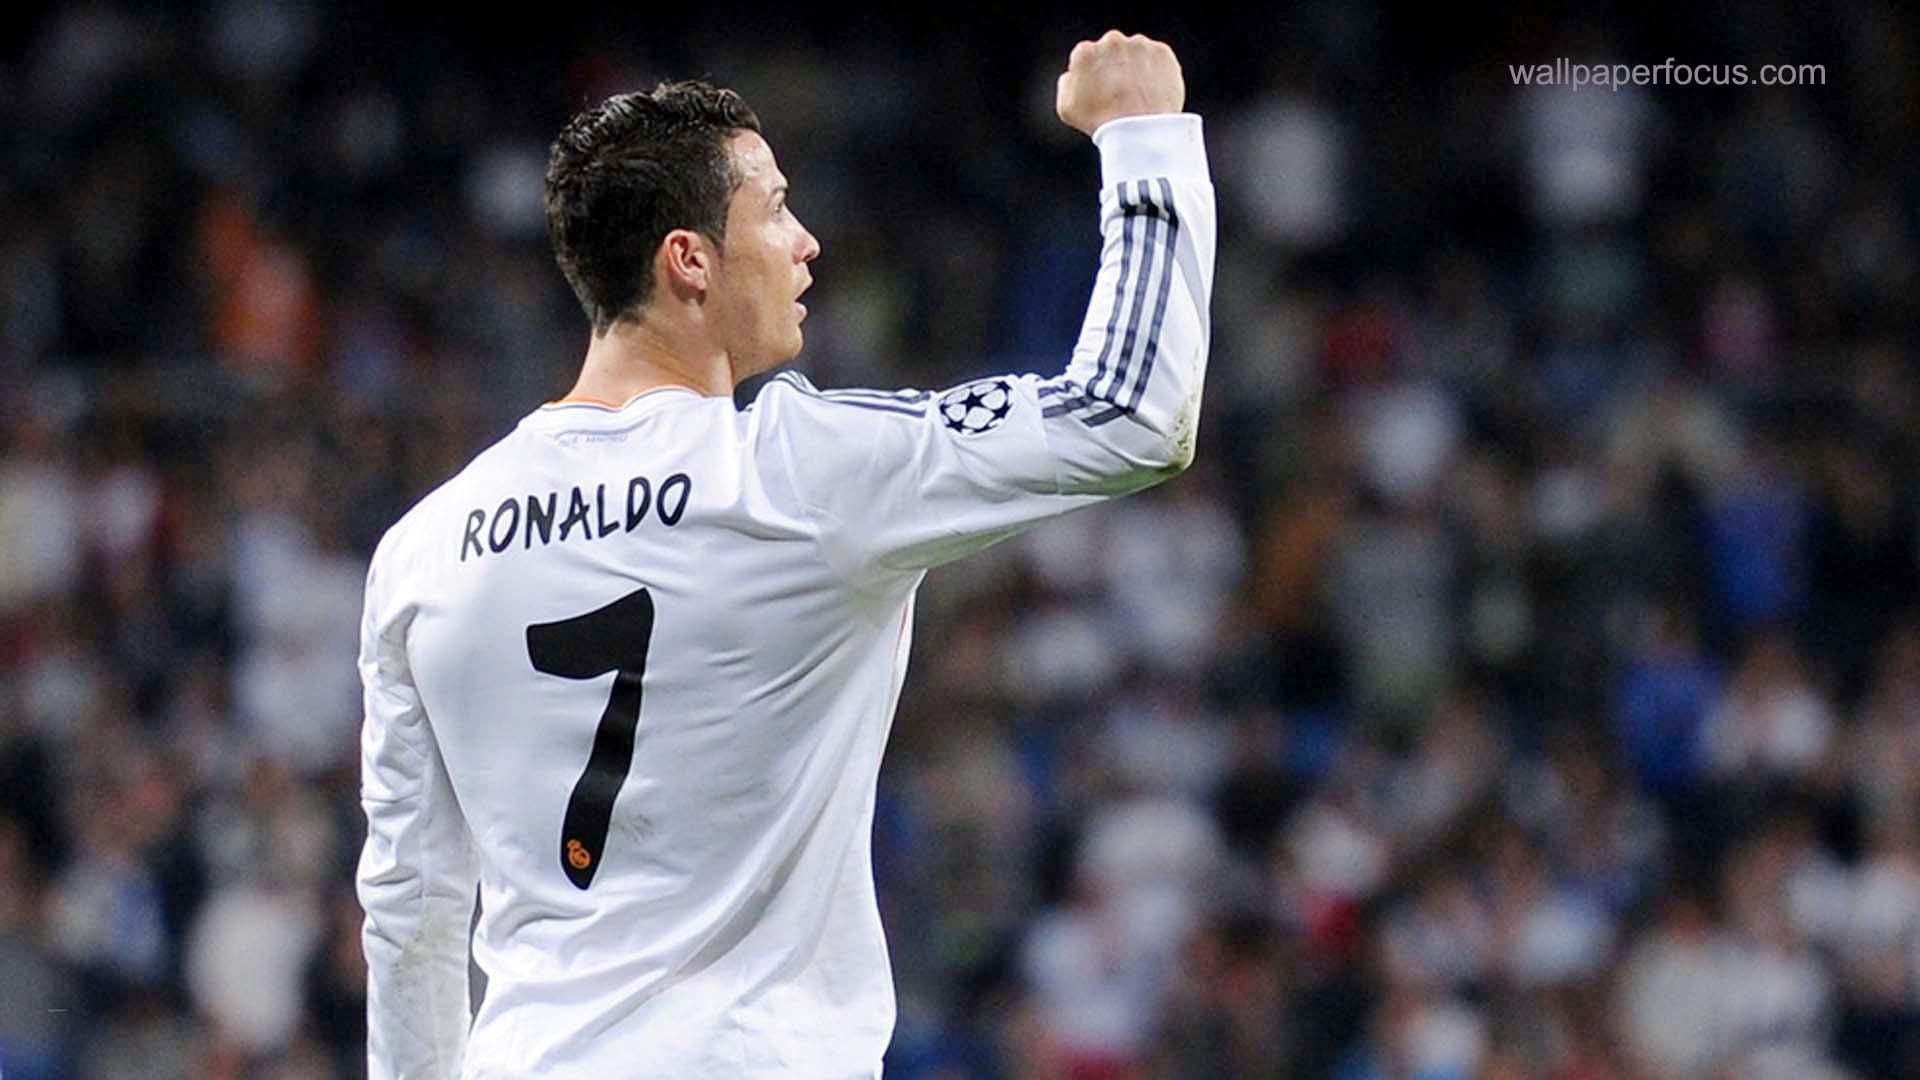 8aa58dd3b3d 1920x1080 2015 Cristiano Ronaldo Celebration Wallpapers